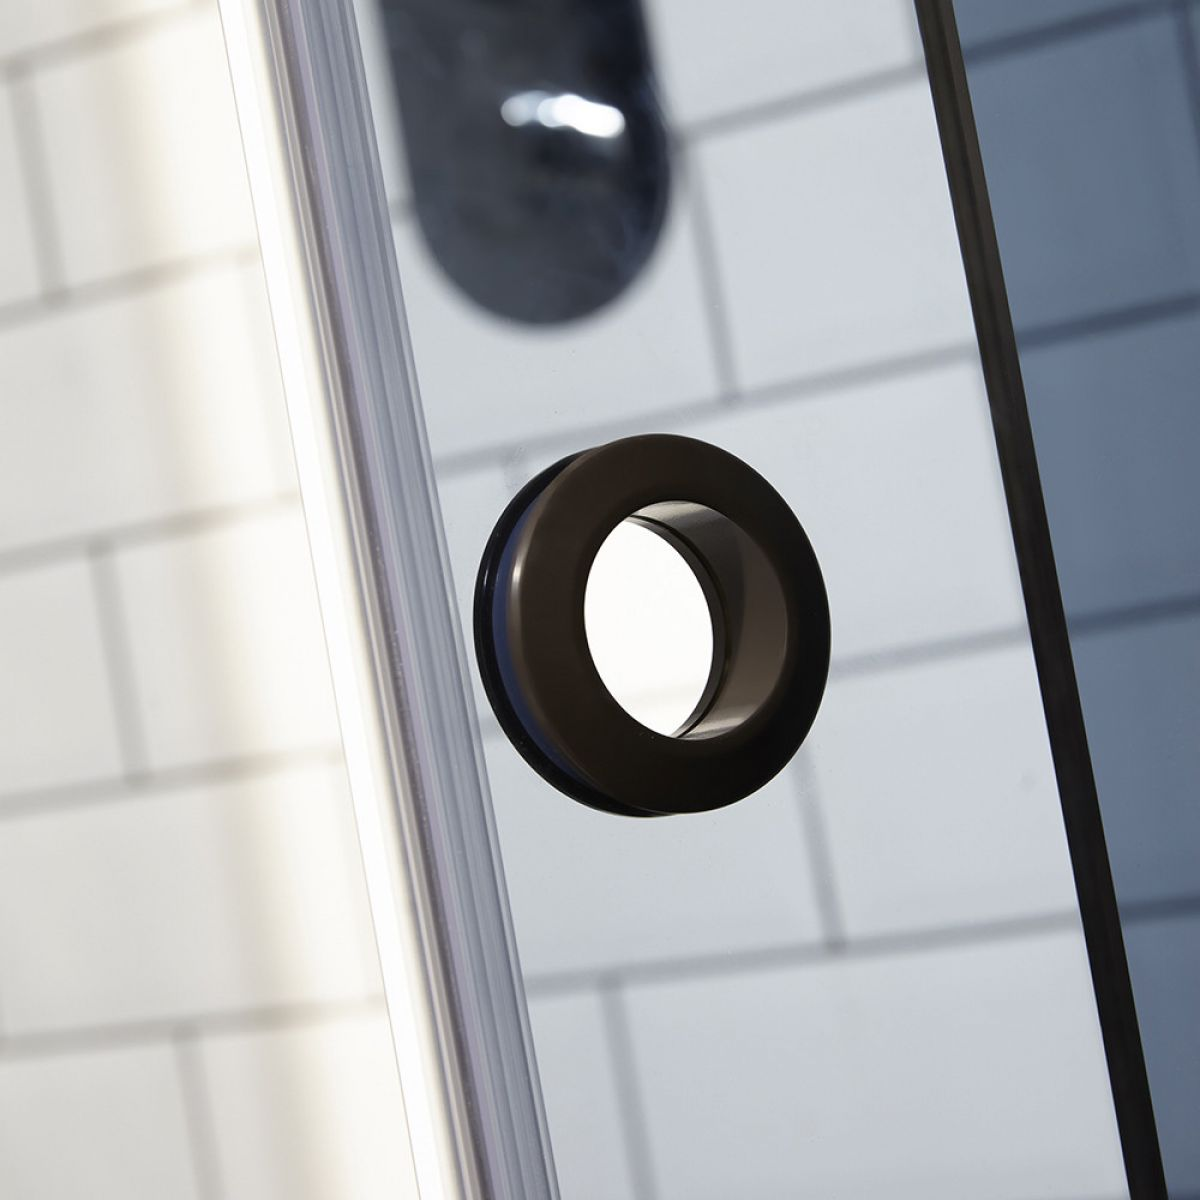 Frontline Aquaglass+ Sphere Black Tinted Quadrant Shower Enclosure Handle